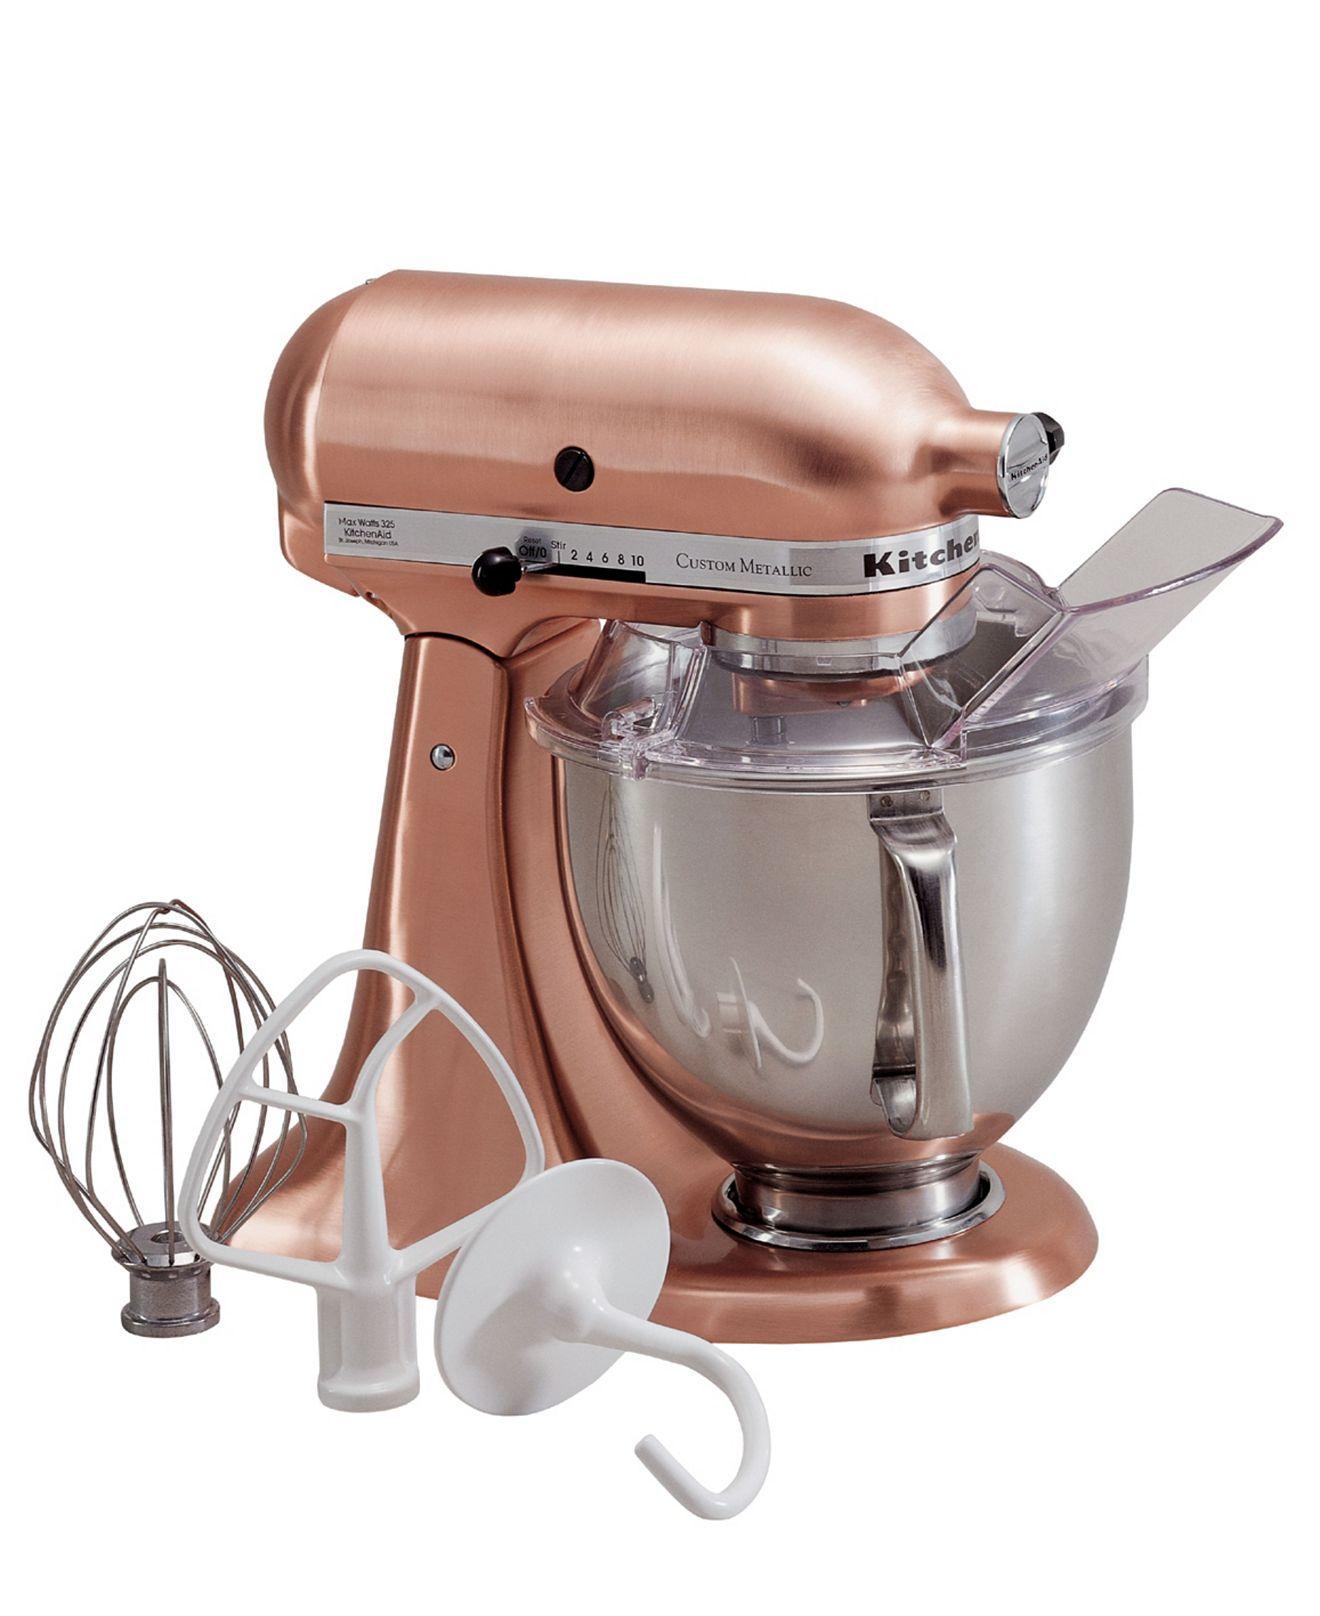 KitchenAid KSM152PS Artisan 5 Qt. Custom Metallic Stand Mixer ...